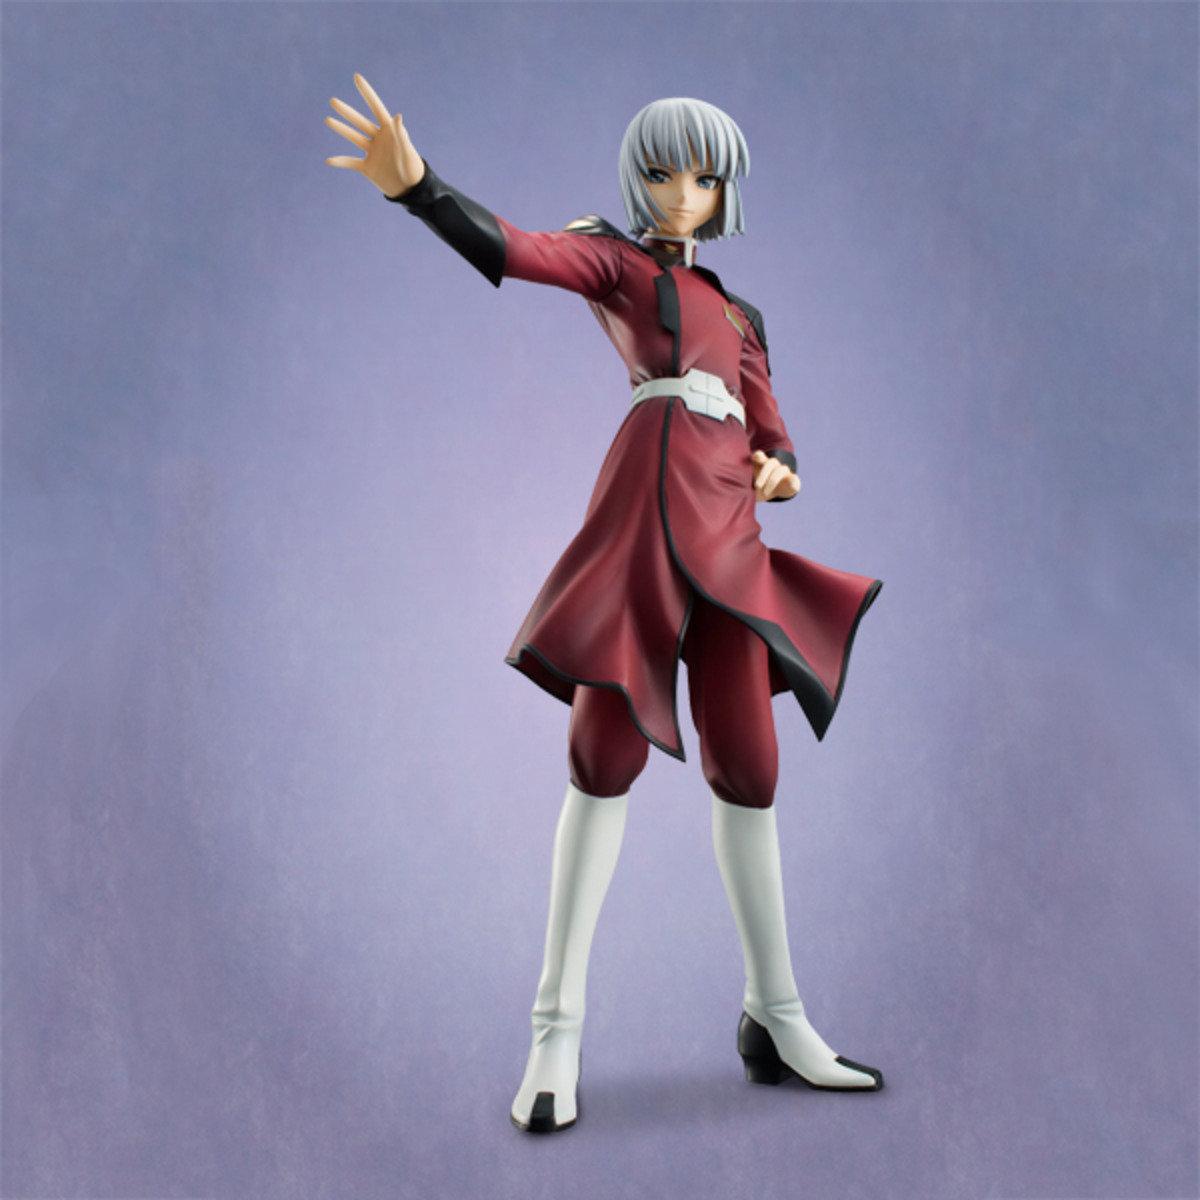 Alpha Omega 系列 機動戰士 Gundam Seed 1/8 伊撒古·尊路